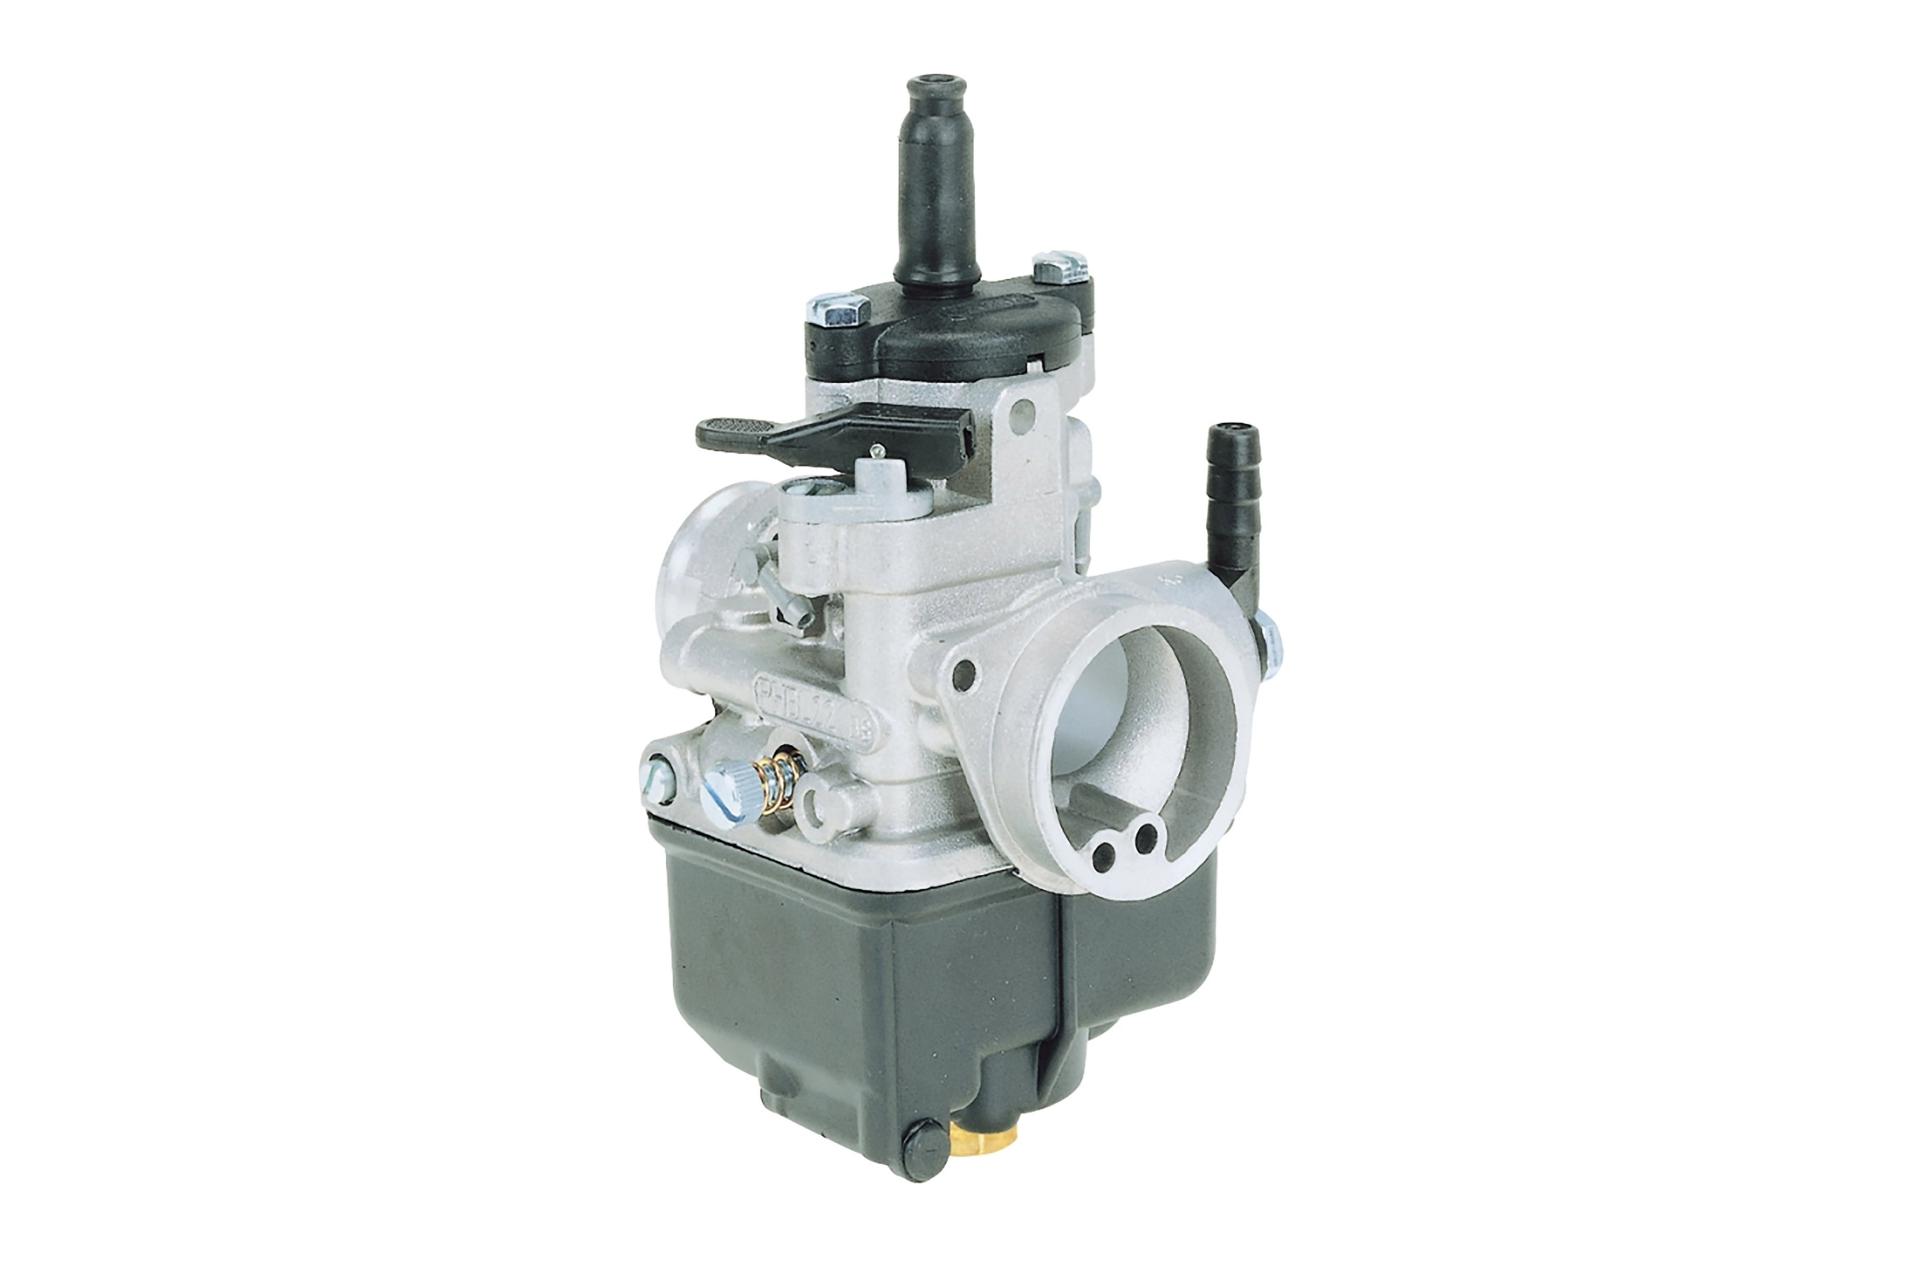 Carburateur Malossi 2854 PHBL 26 BS